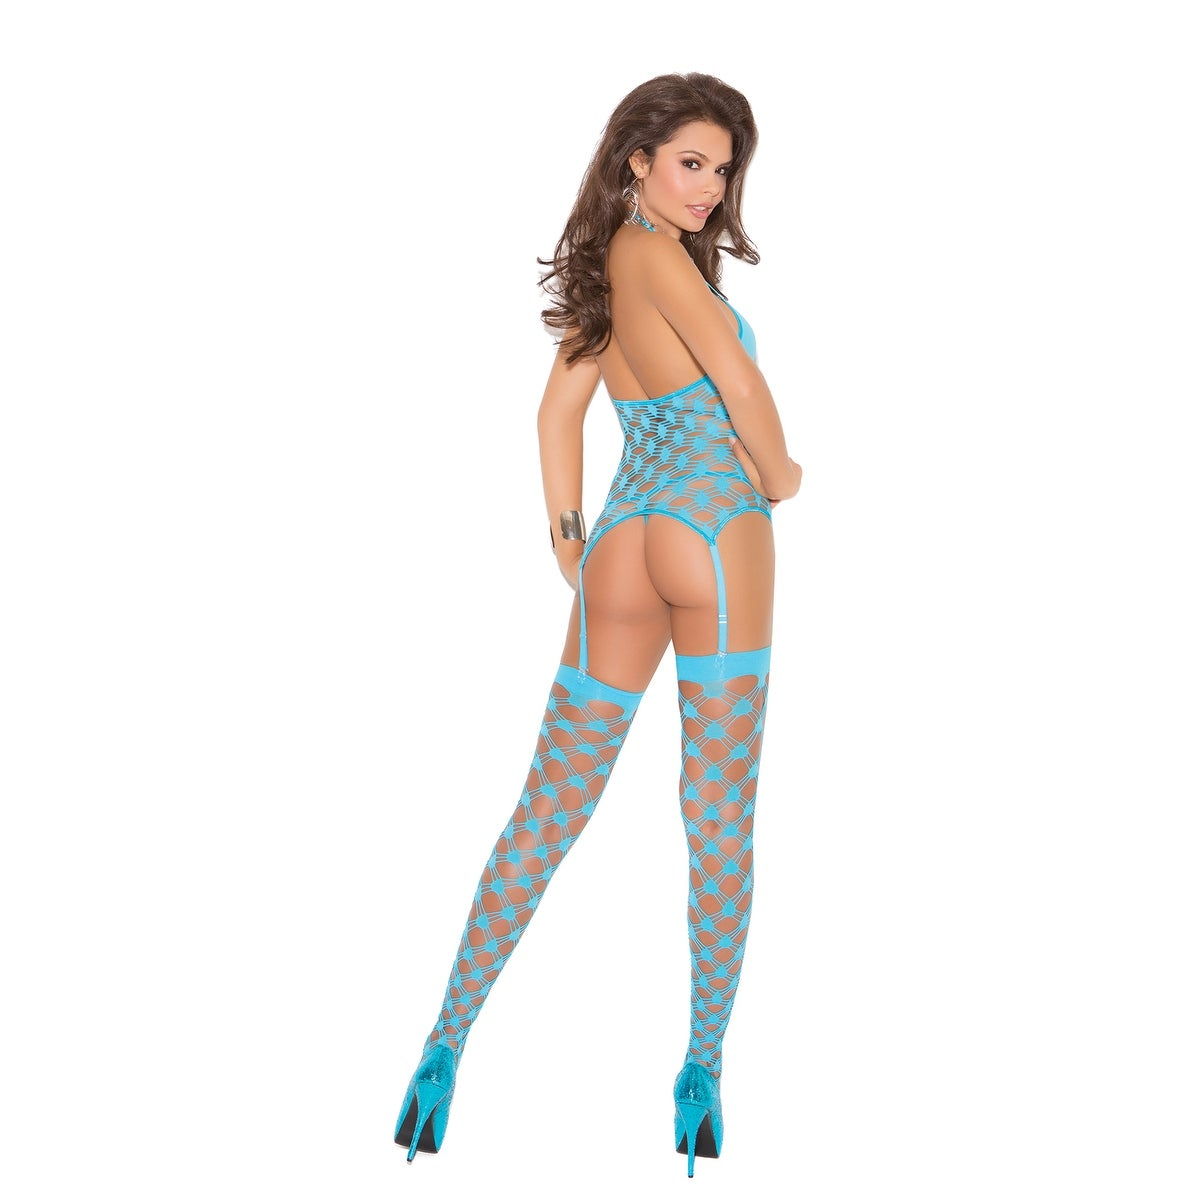 275ac086fa Shop Strappy diamond net camisette